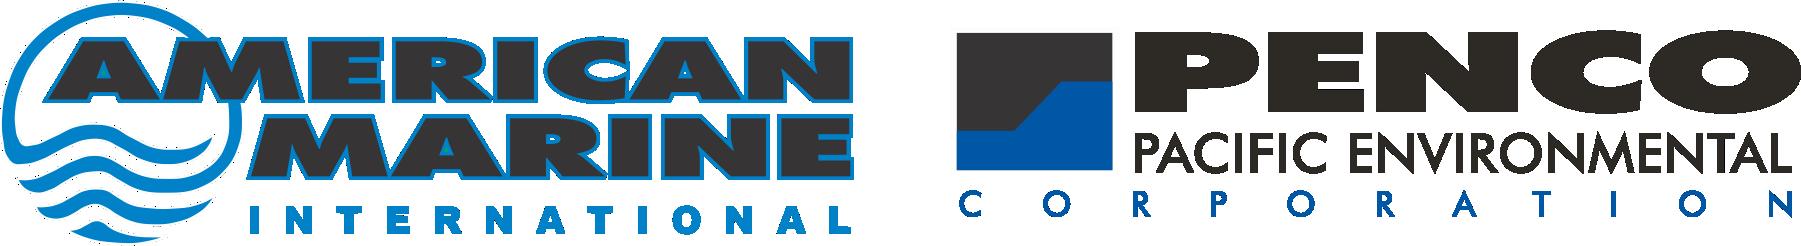 Crown Sponsorships - $2,500 - PENCO/American Marine - Logo